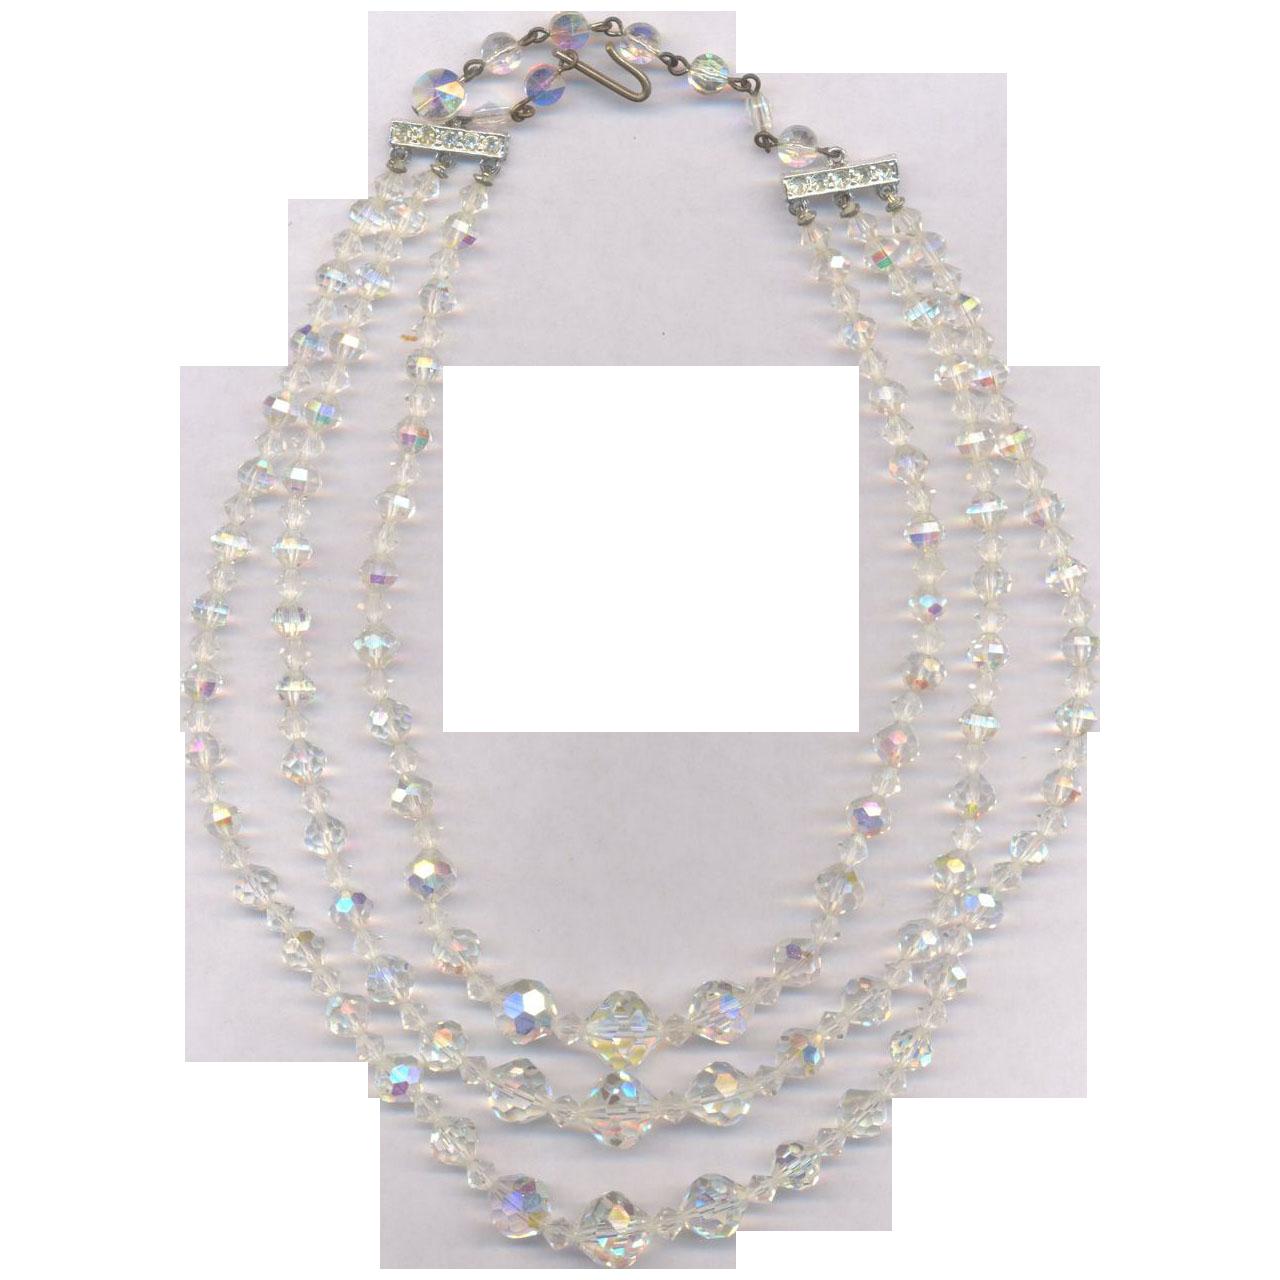 Vintage 3 Strand Crystal Glass Necklace